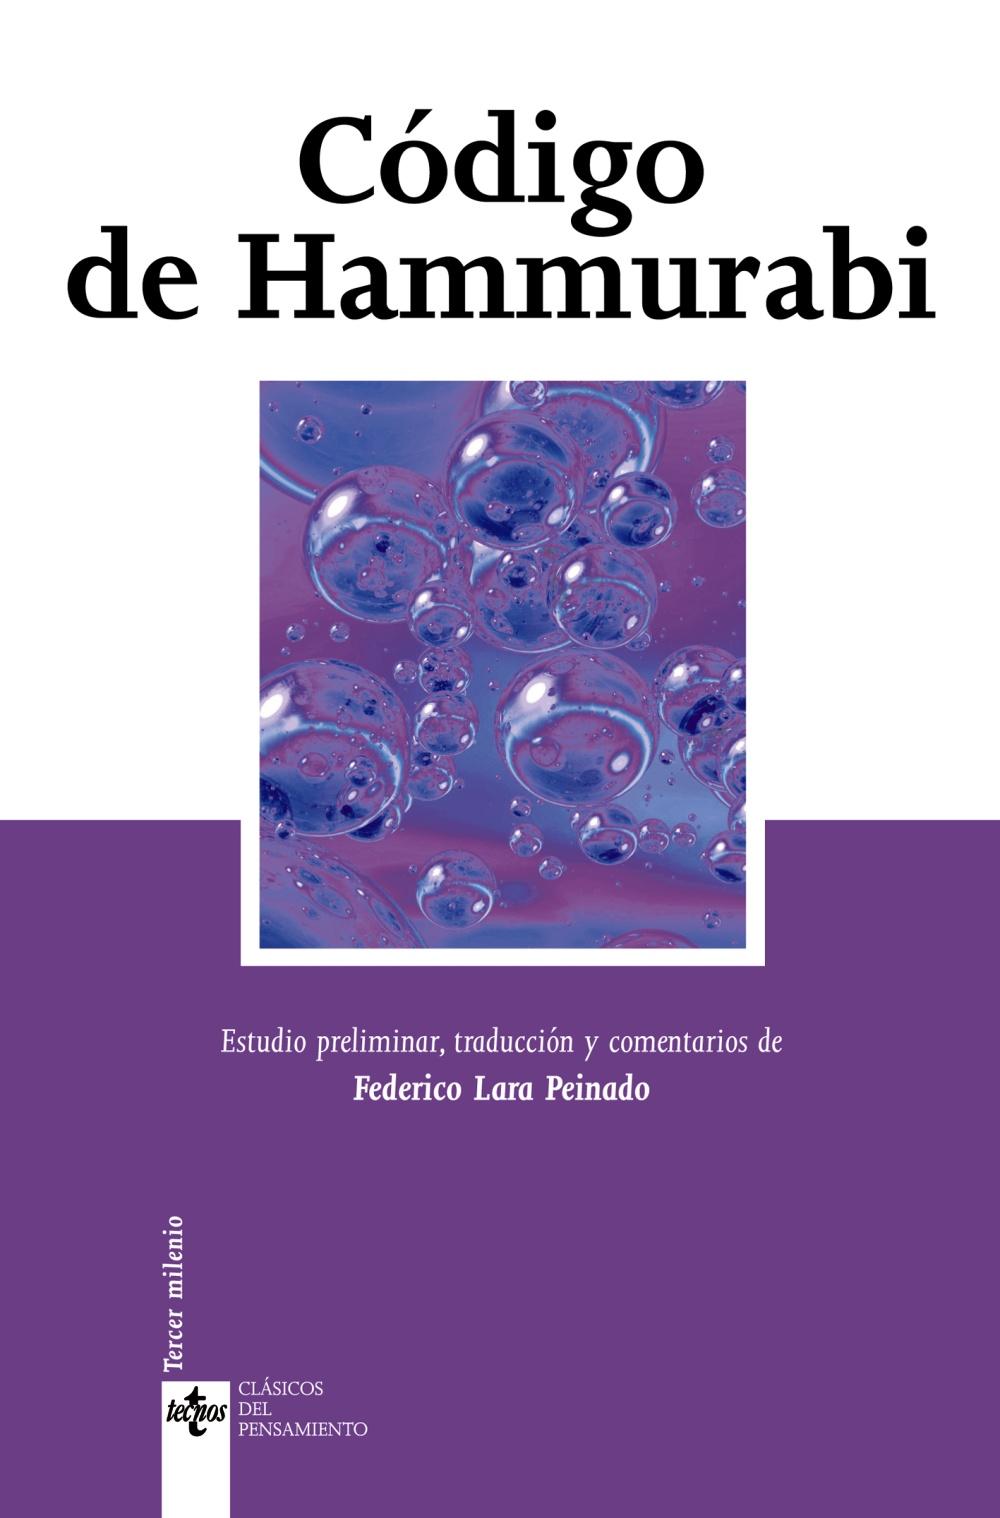 Codigo De Hammurabi - Lara Peinado Federico (ed.)